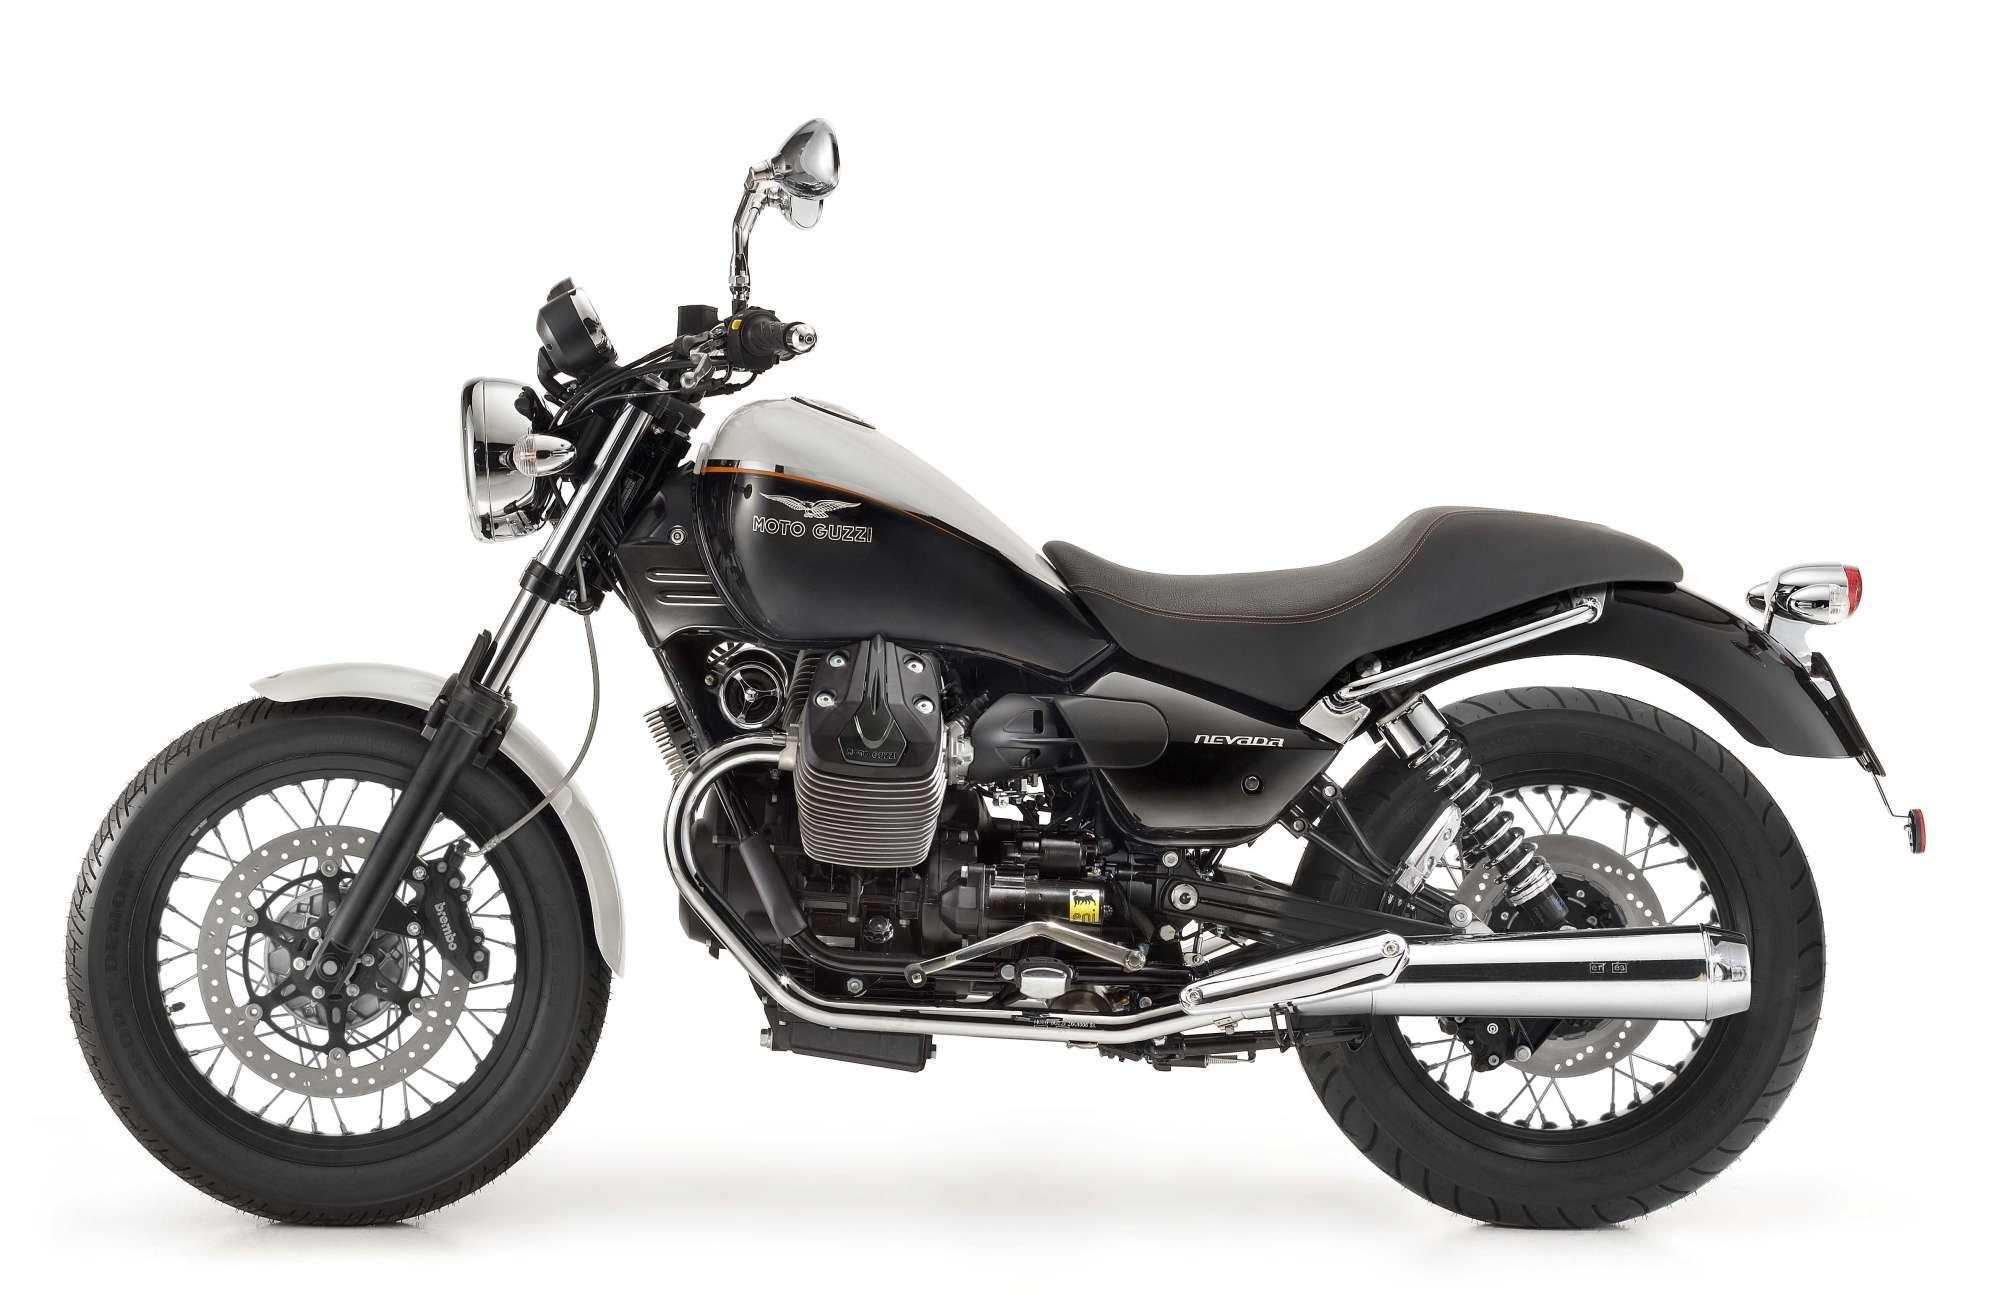 motorrad occasion moto guzzi nevada 750 classic kaufen. Black Bedroom Furniture Sets. Home Design Ideas